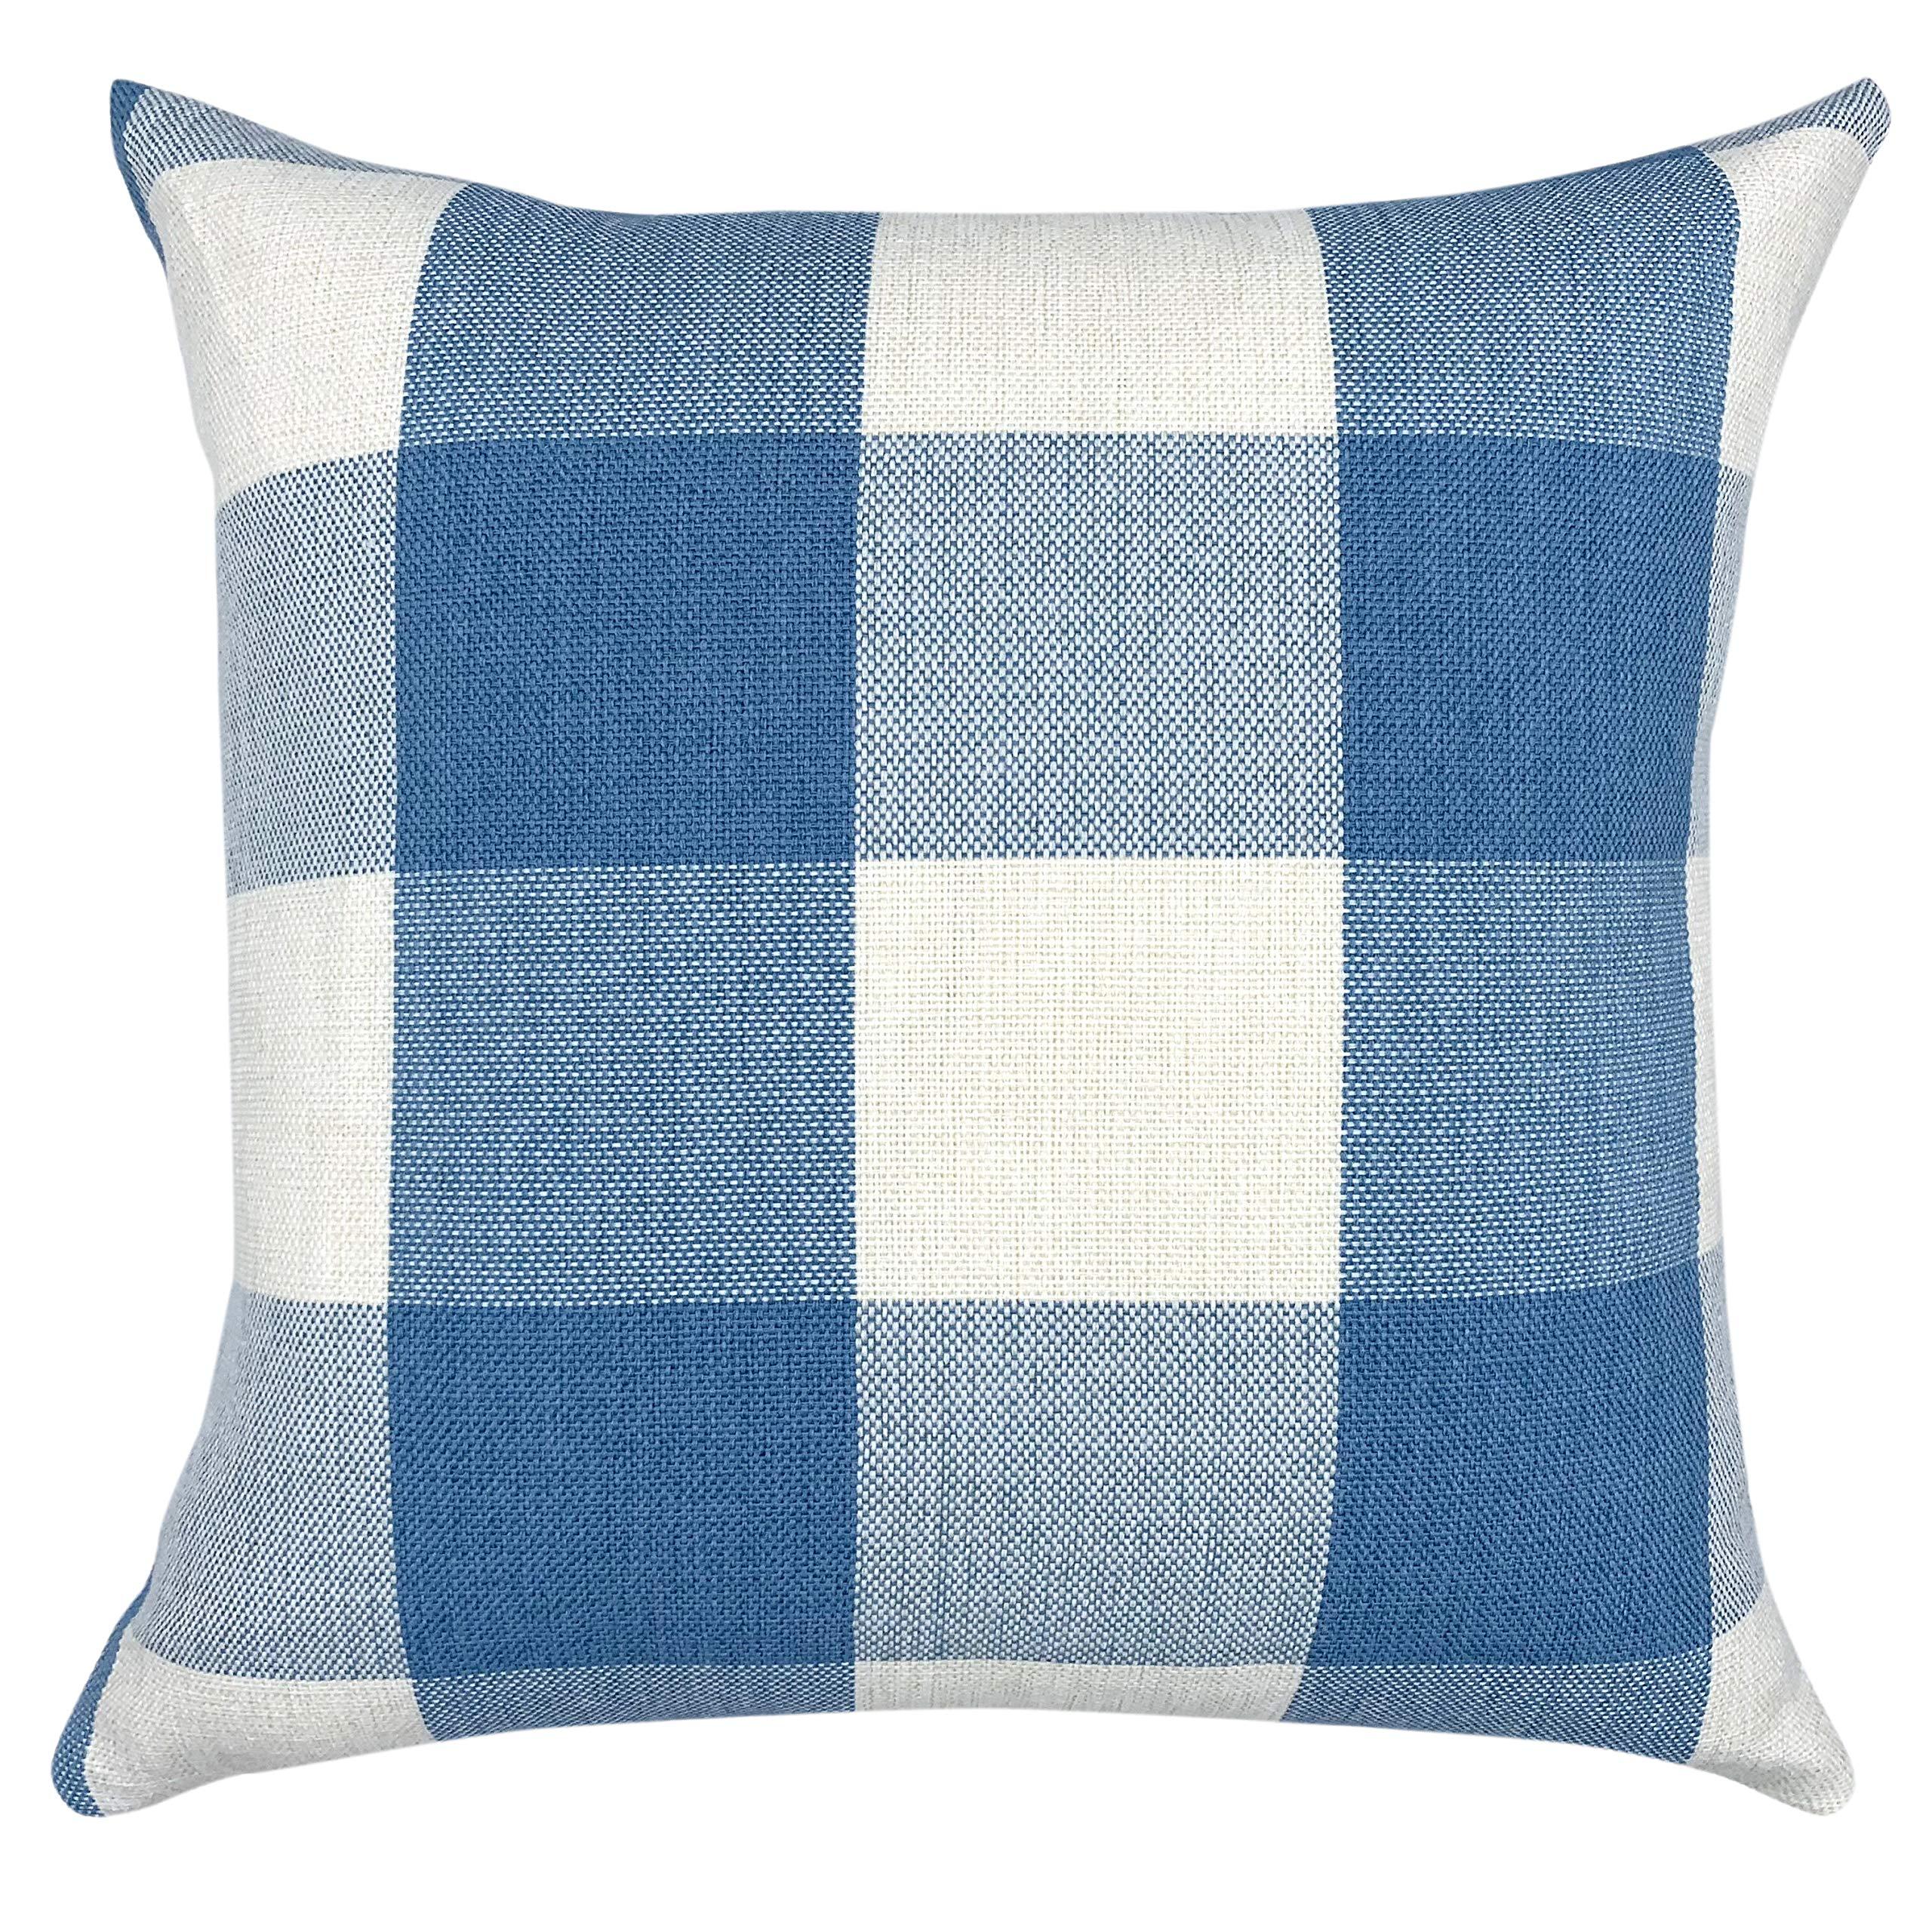 YOUR SMILE Retro Farmhouse Buffalo Tartan Checkers Plaid Cotton Linen Decorative Throw Pillow Case Cushion Cover Pillowcase for Sofa 20 x 20 Inch,Baby Blue/White